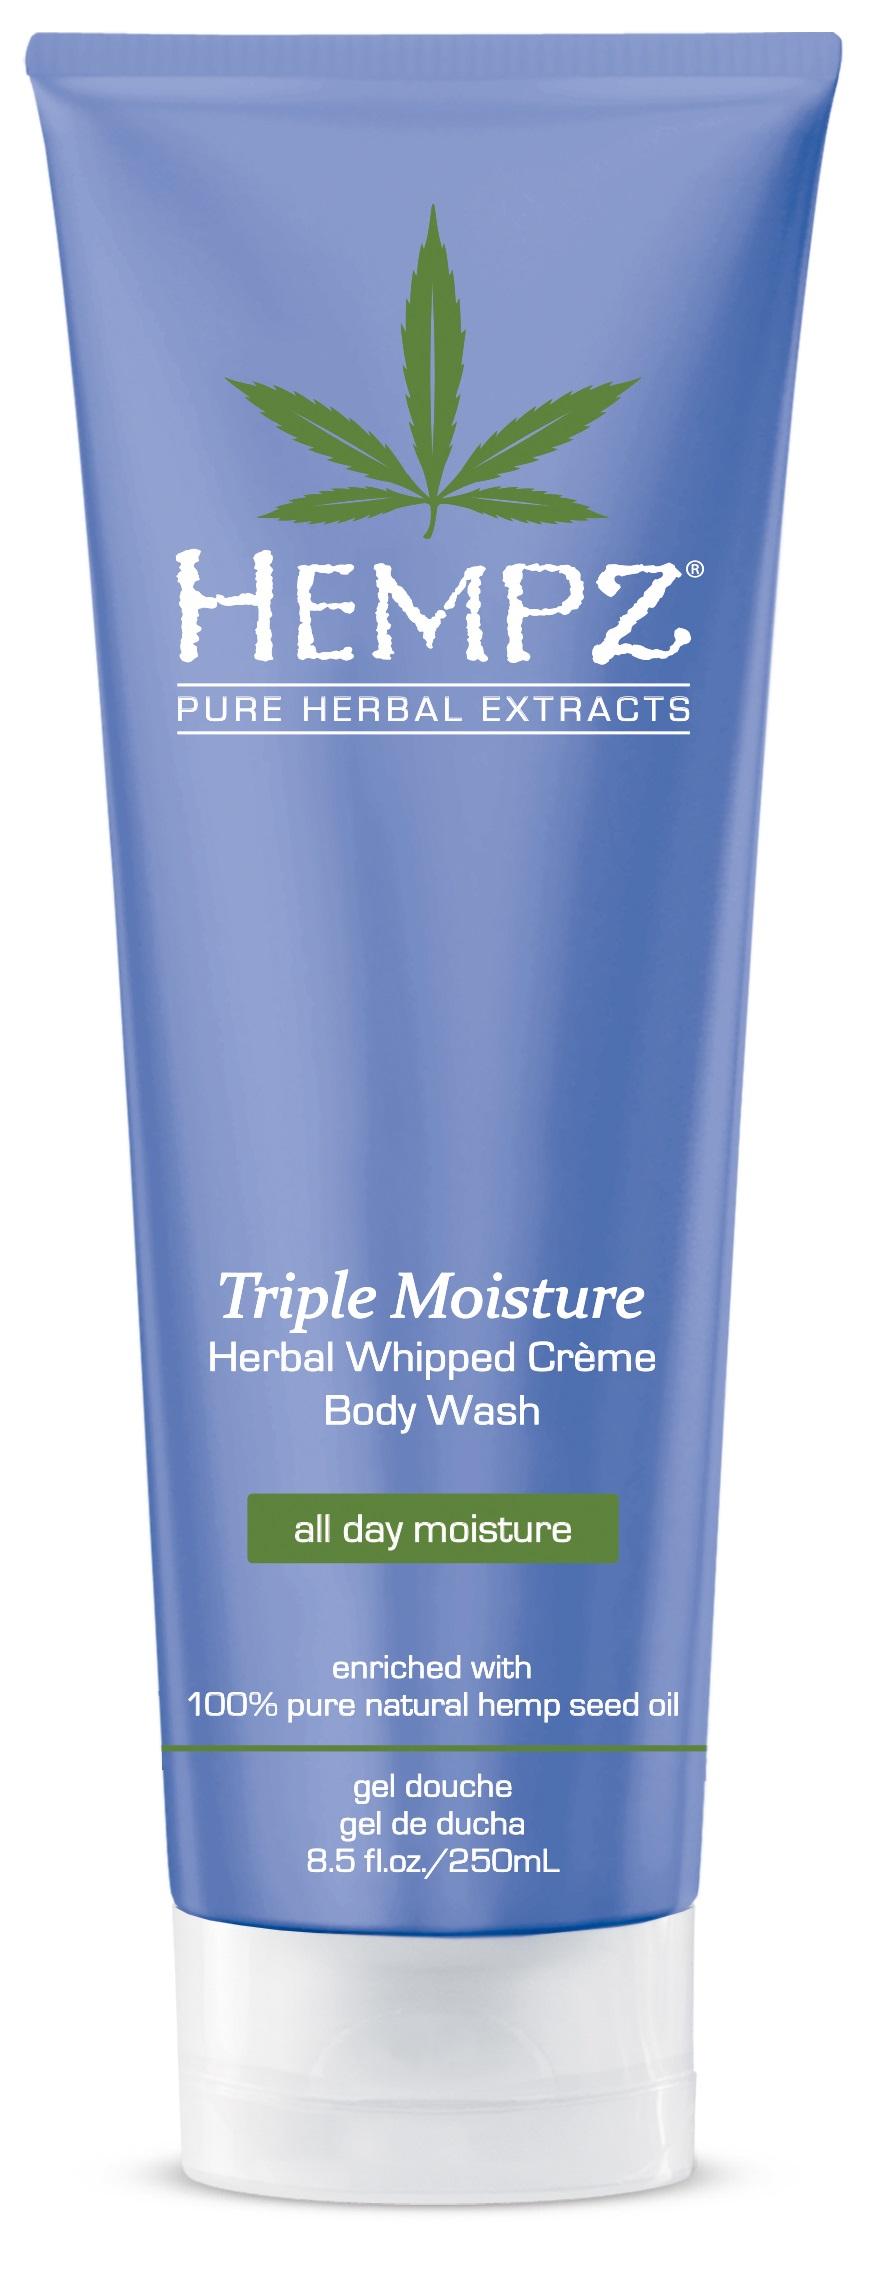 Image of Hempz Triple Moisture Herbal whipped Creme Body Wash 250ml